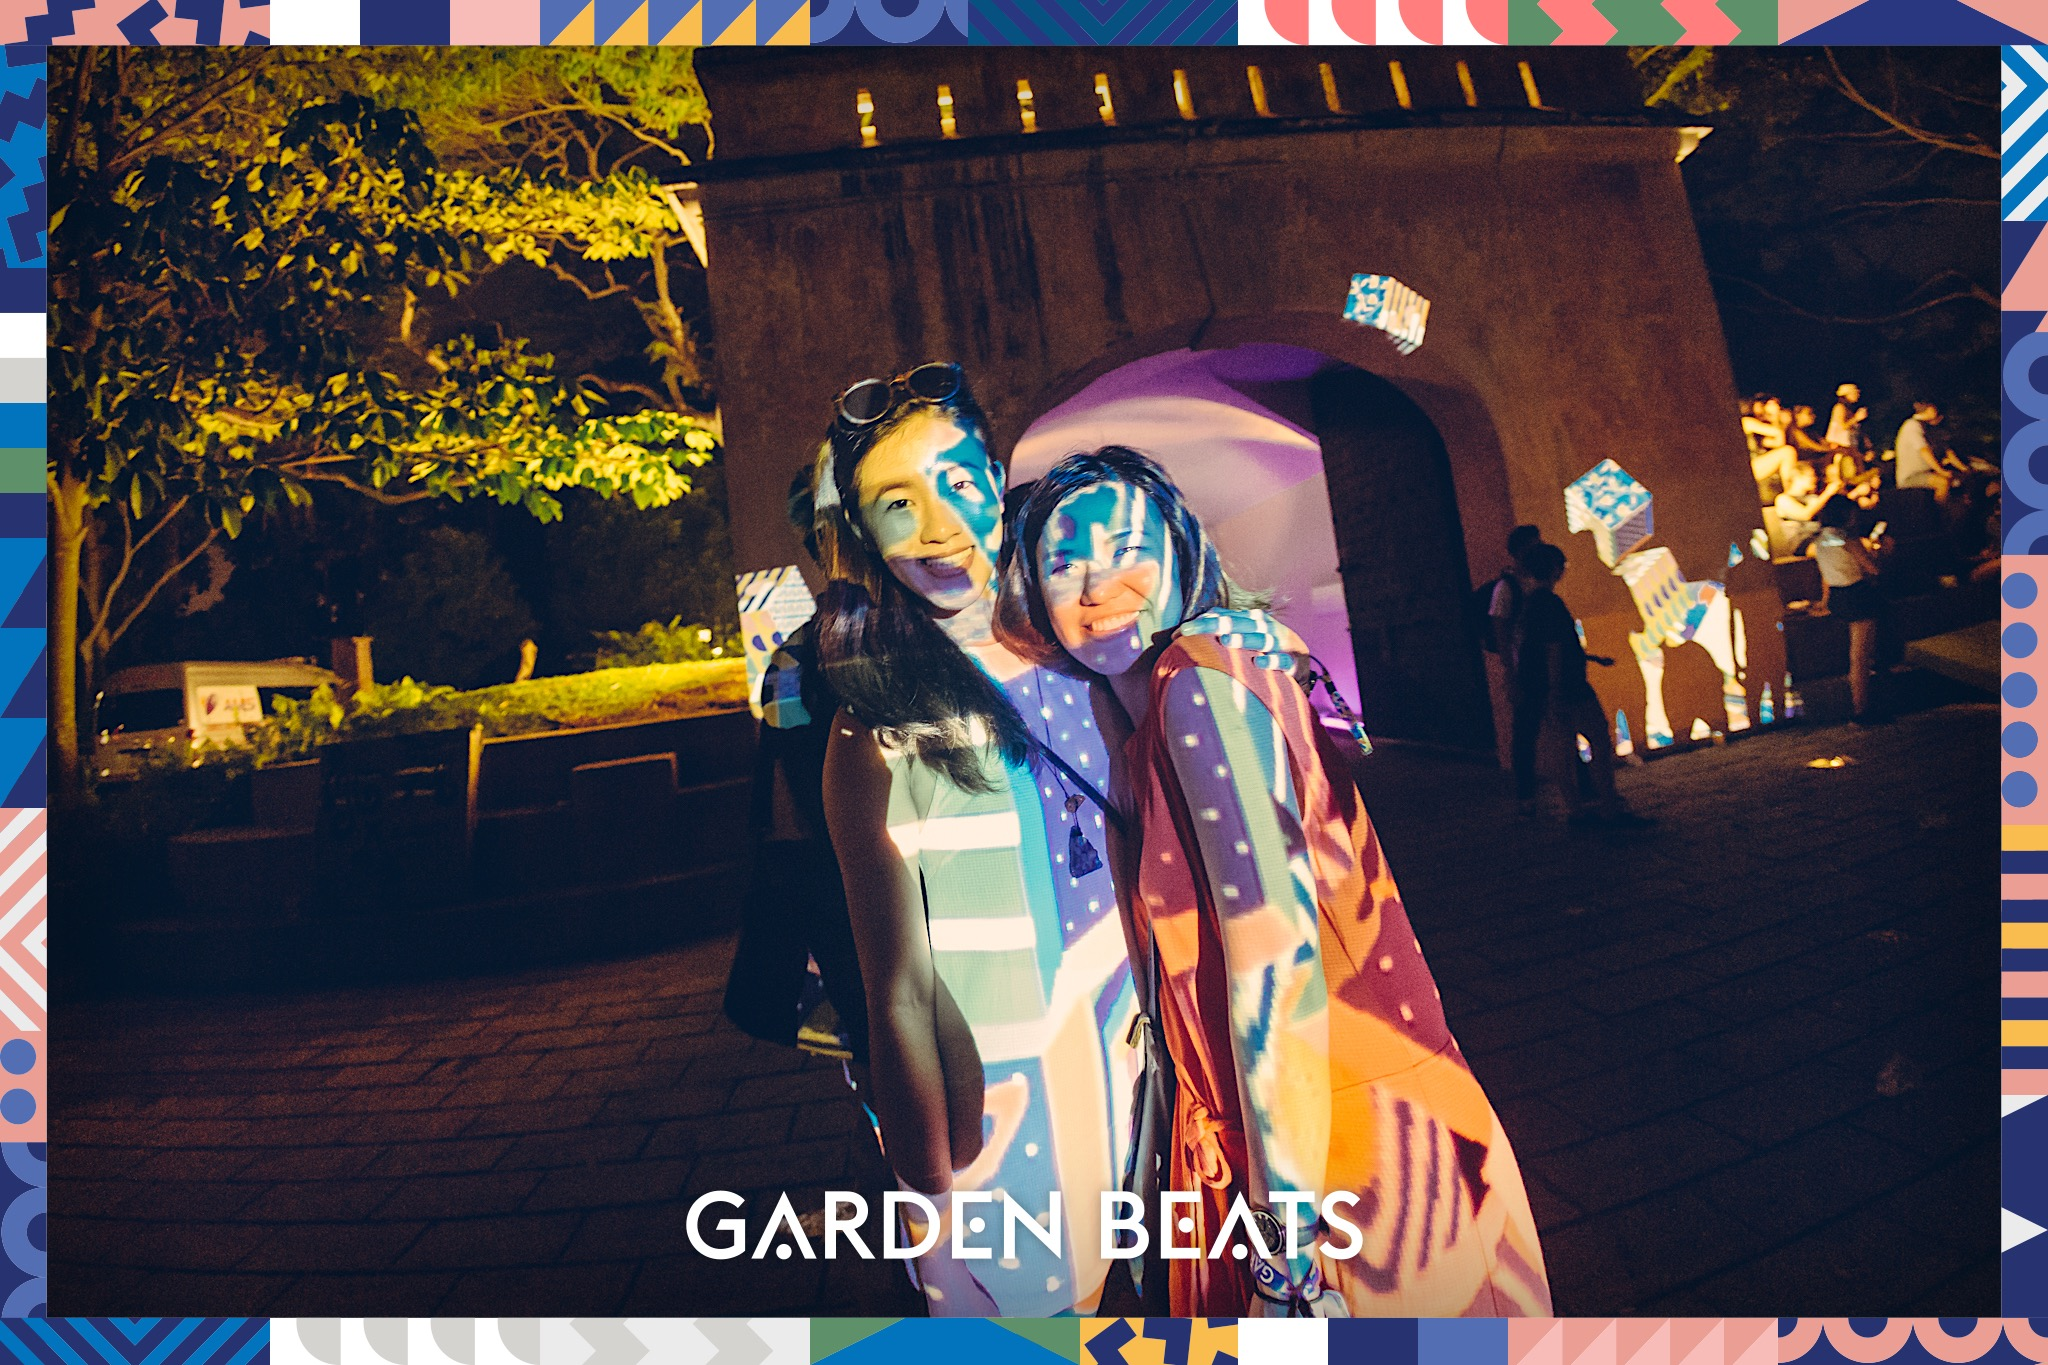 18032017_GardenBeats_Colossal835_WatermarkedGB.jpg